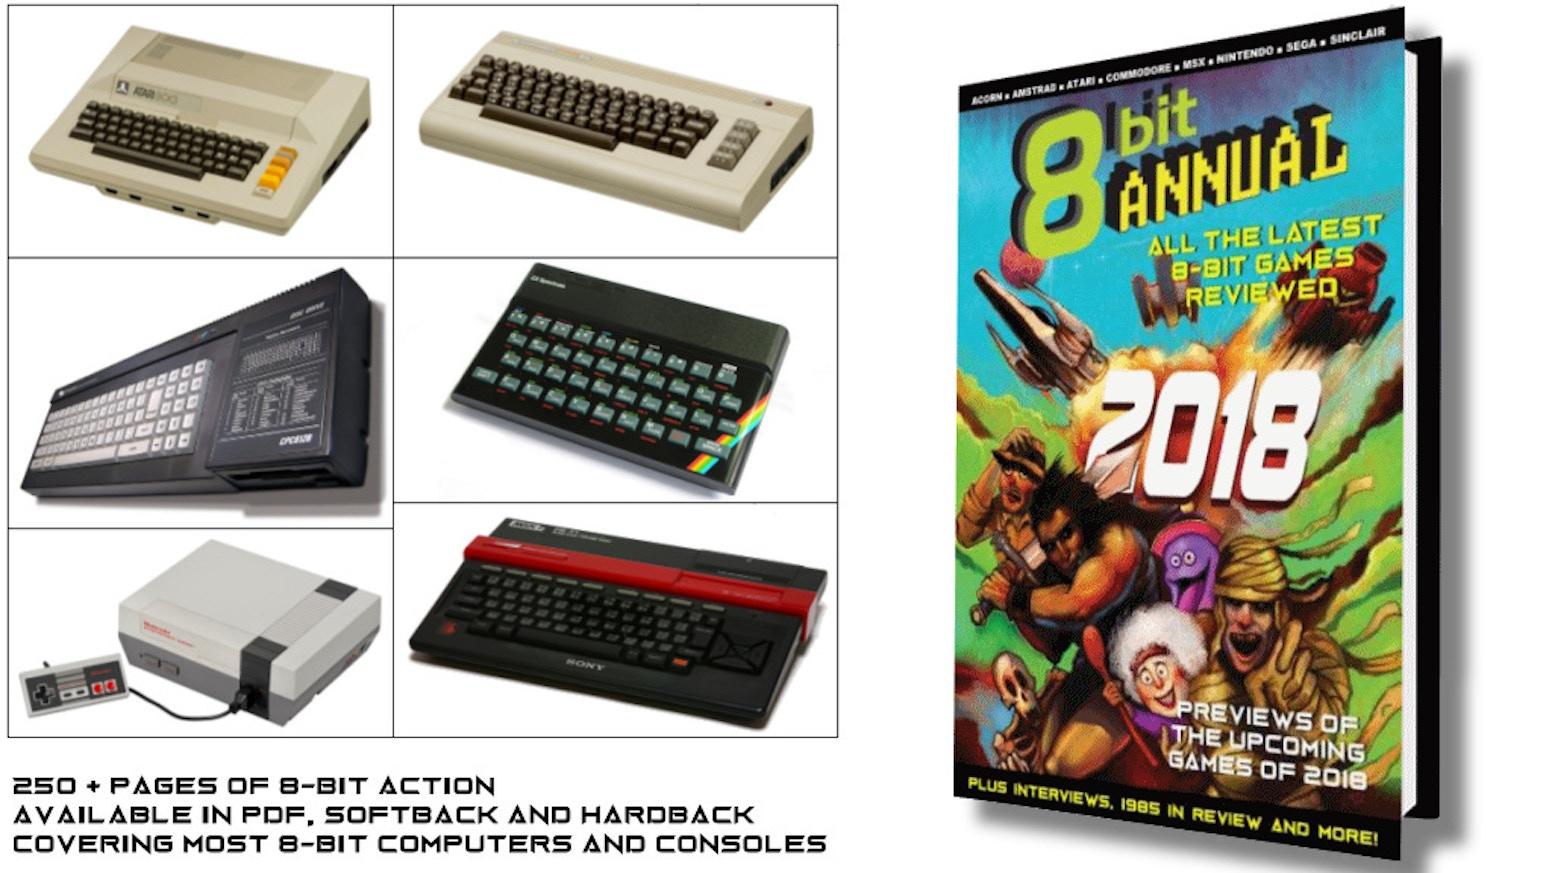 8 Bit Annual reviews the latest games for 8-bit computers and consoles, Amstrad, Atari, Commodore, MSX, Nintendo, Sega, Sinclair etc